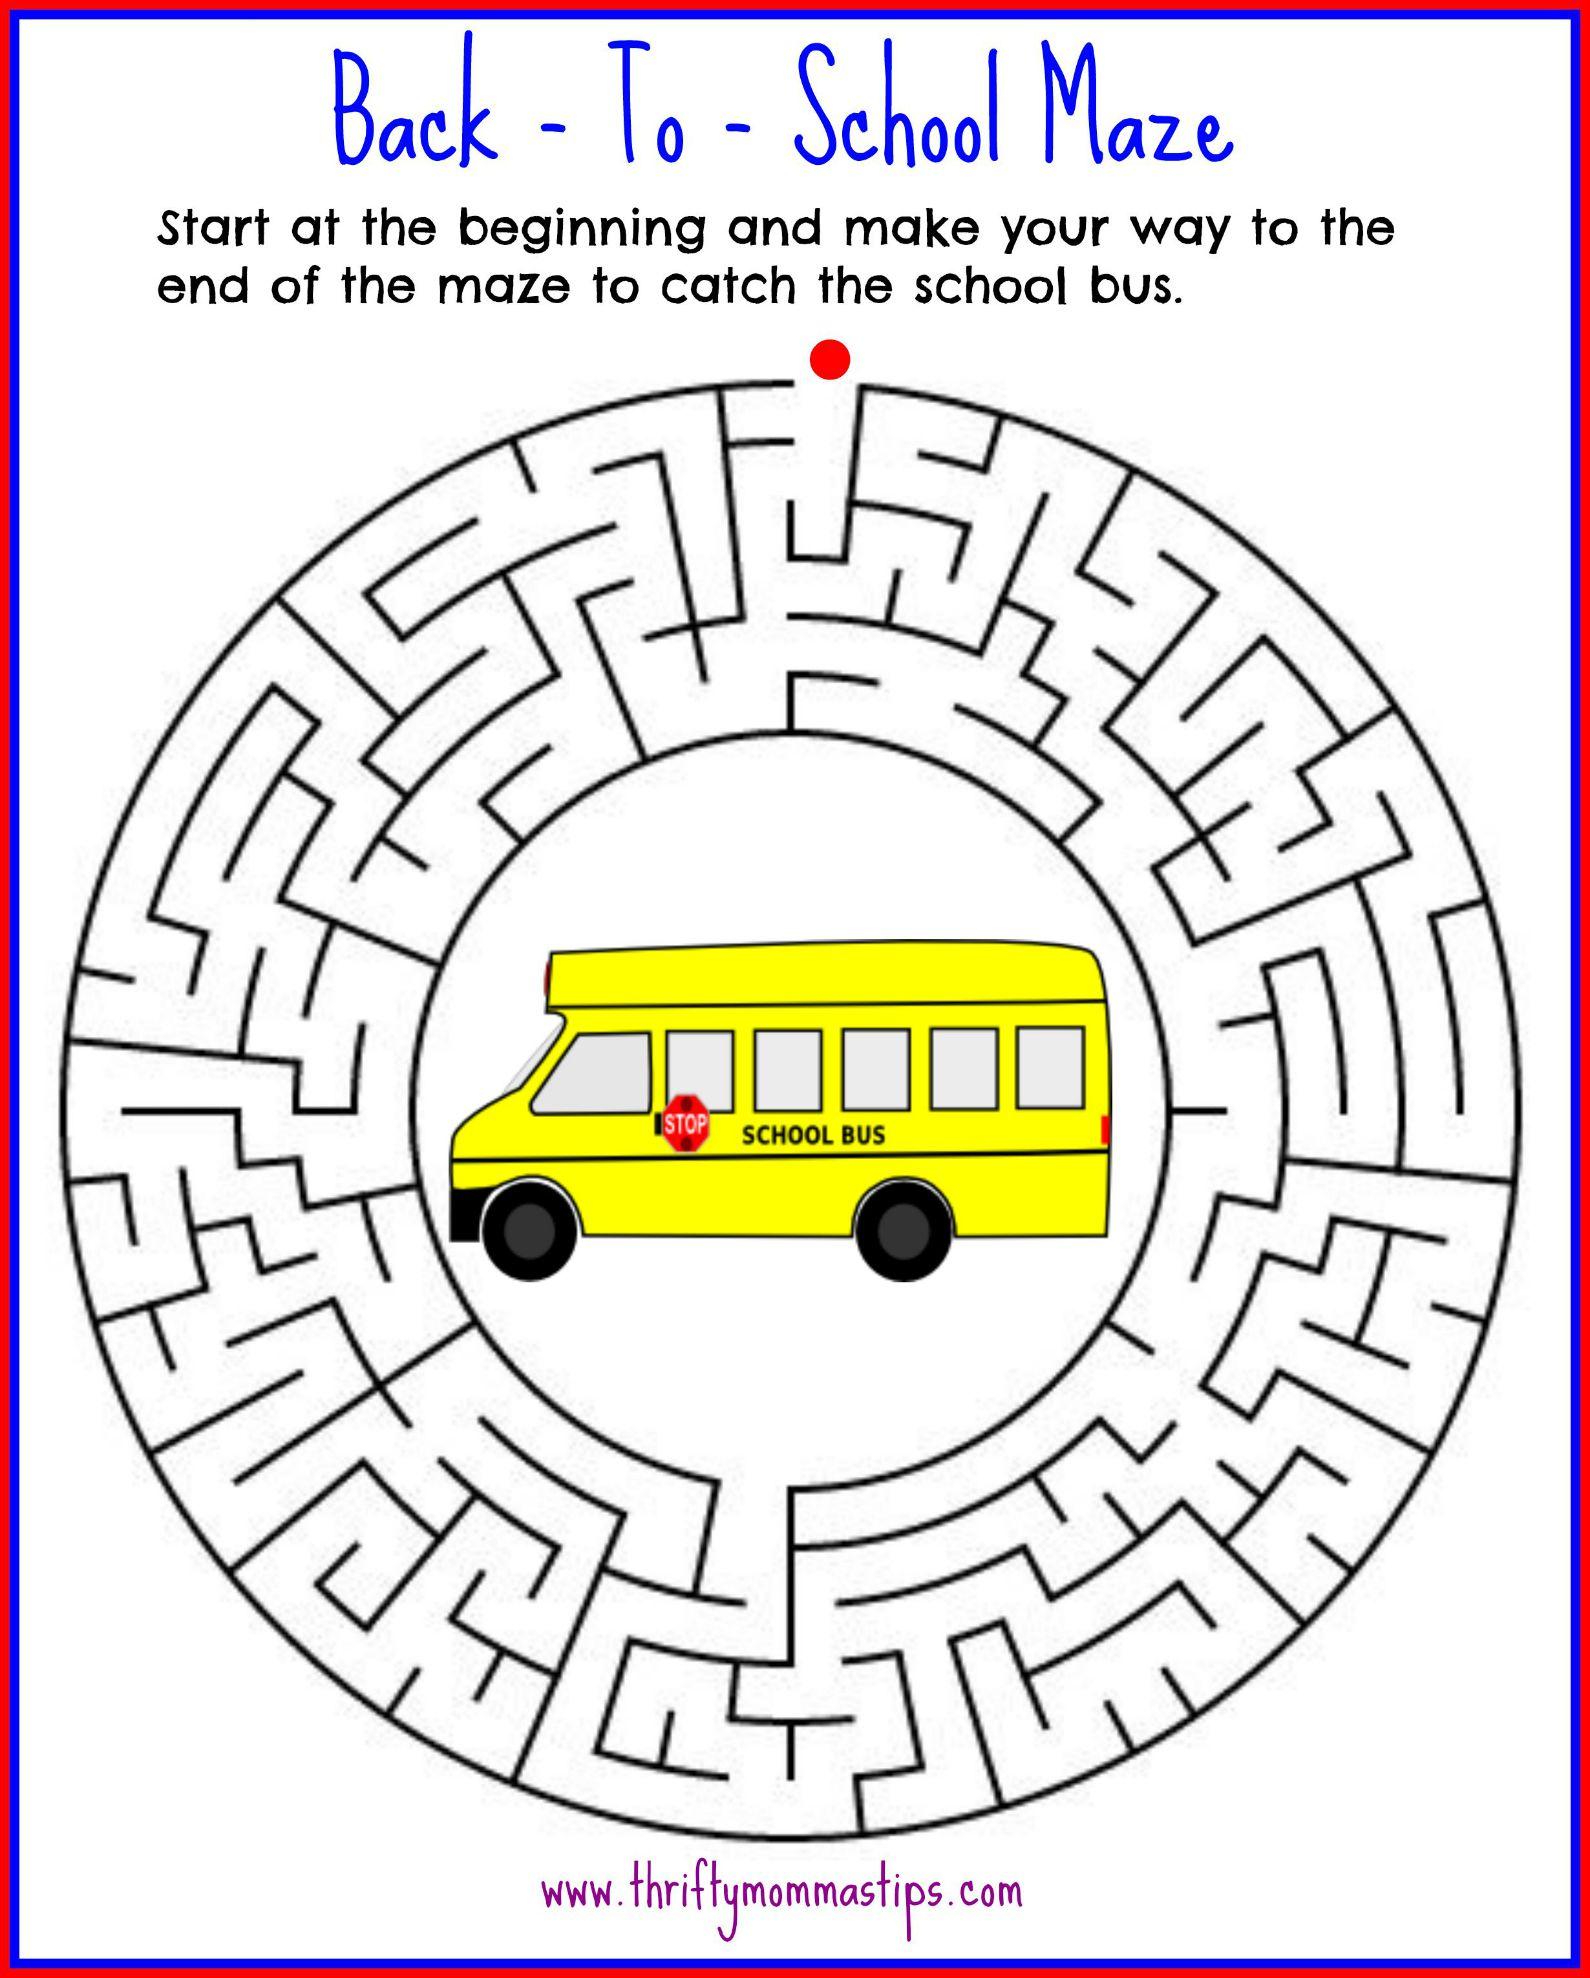 Back To School Maze Printable